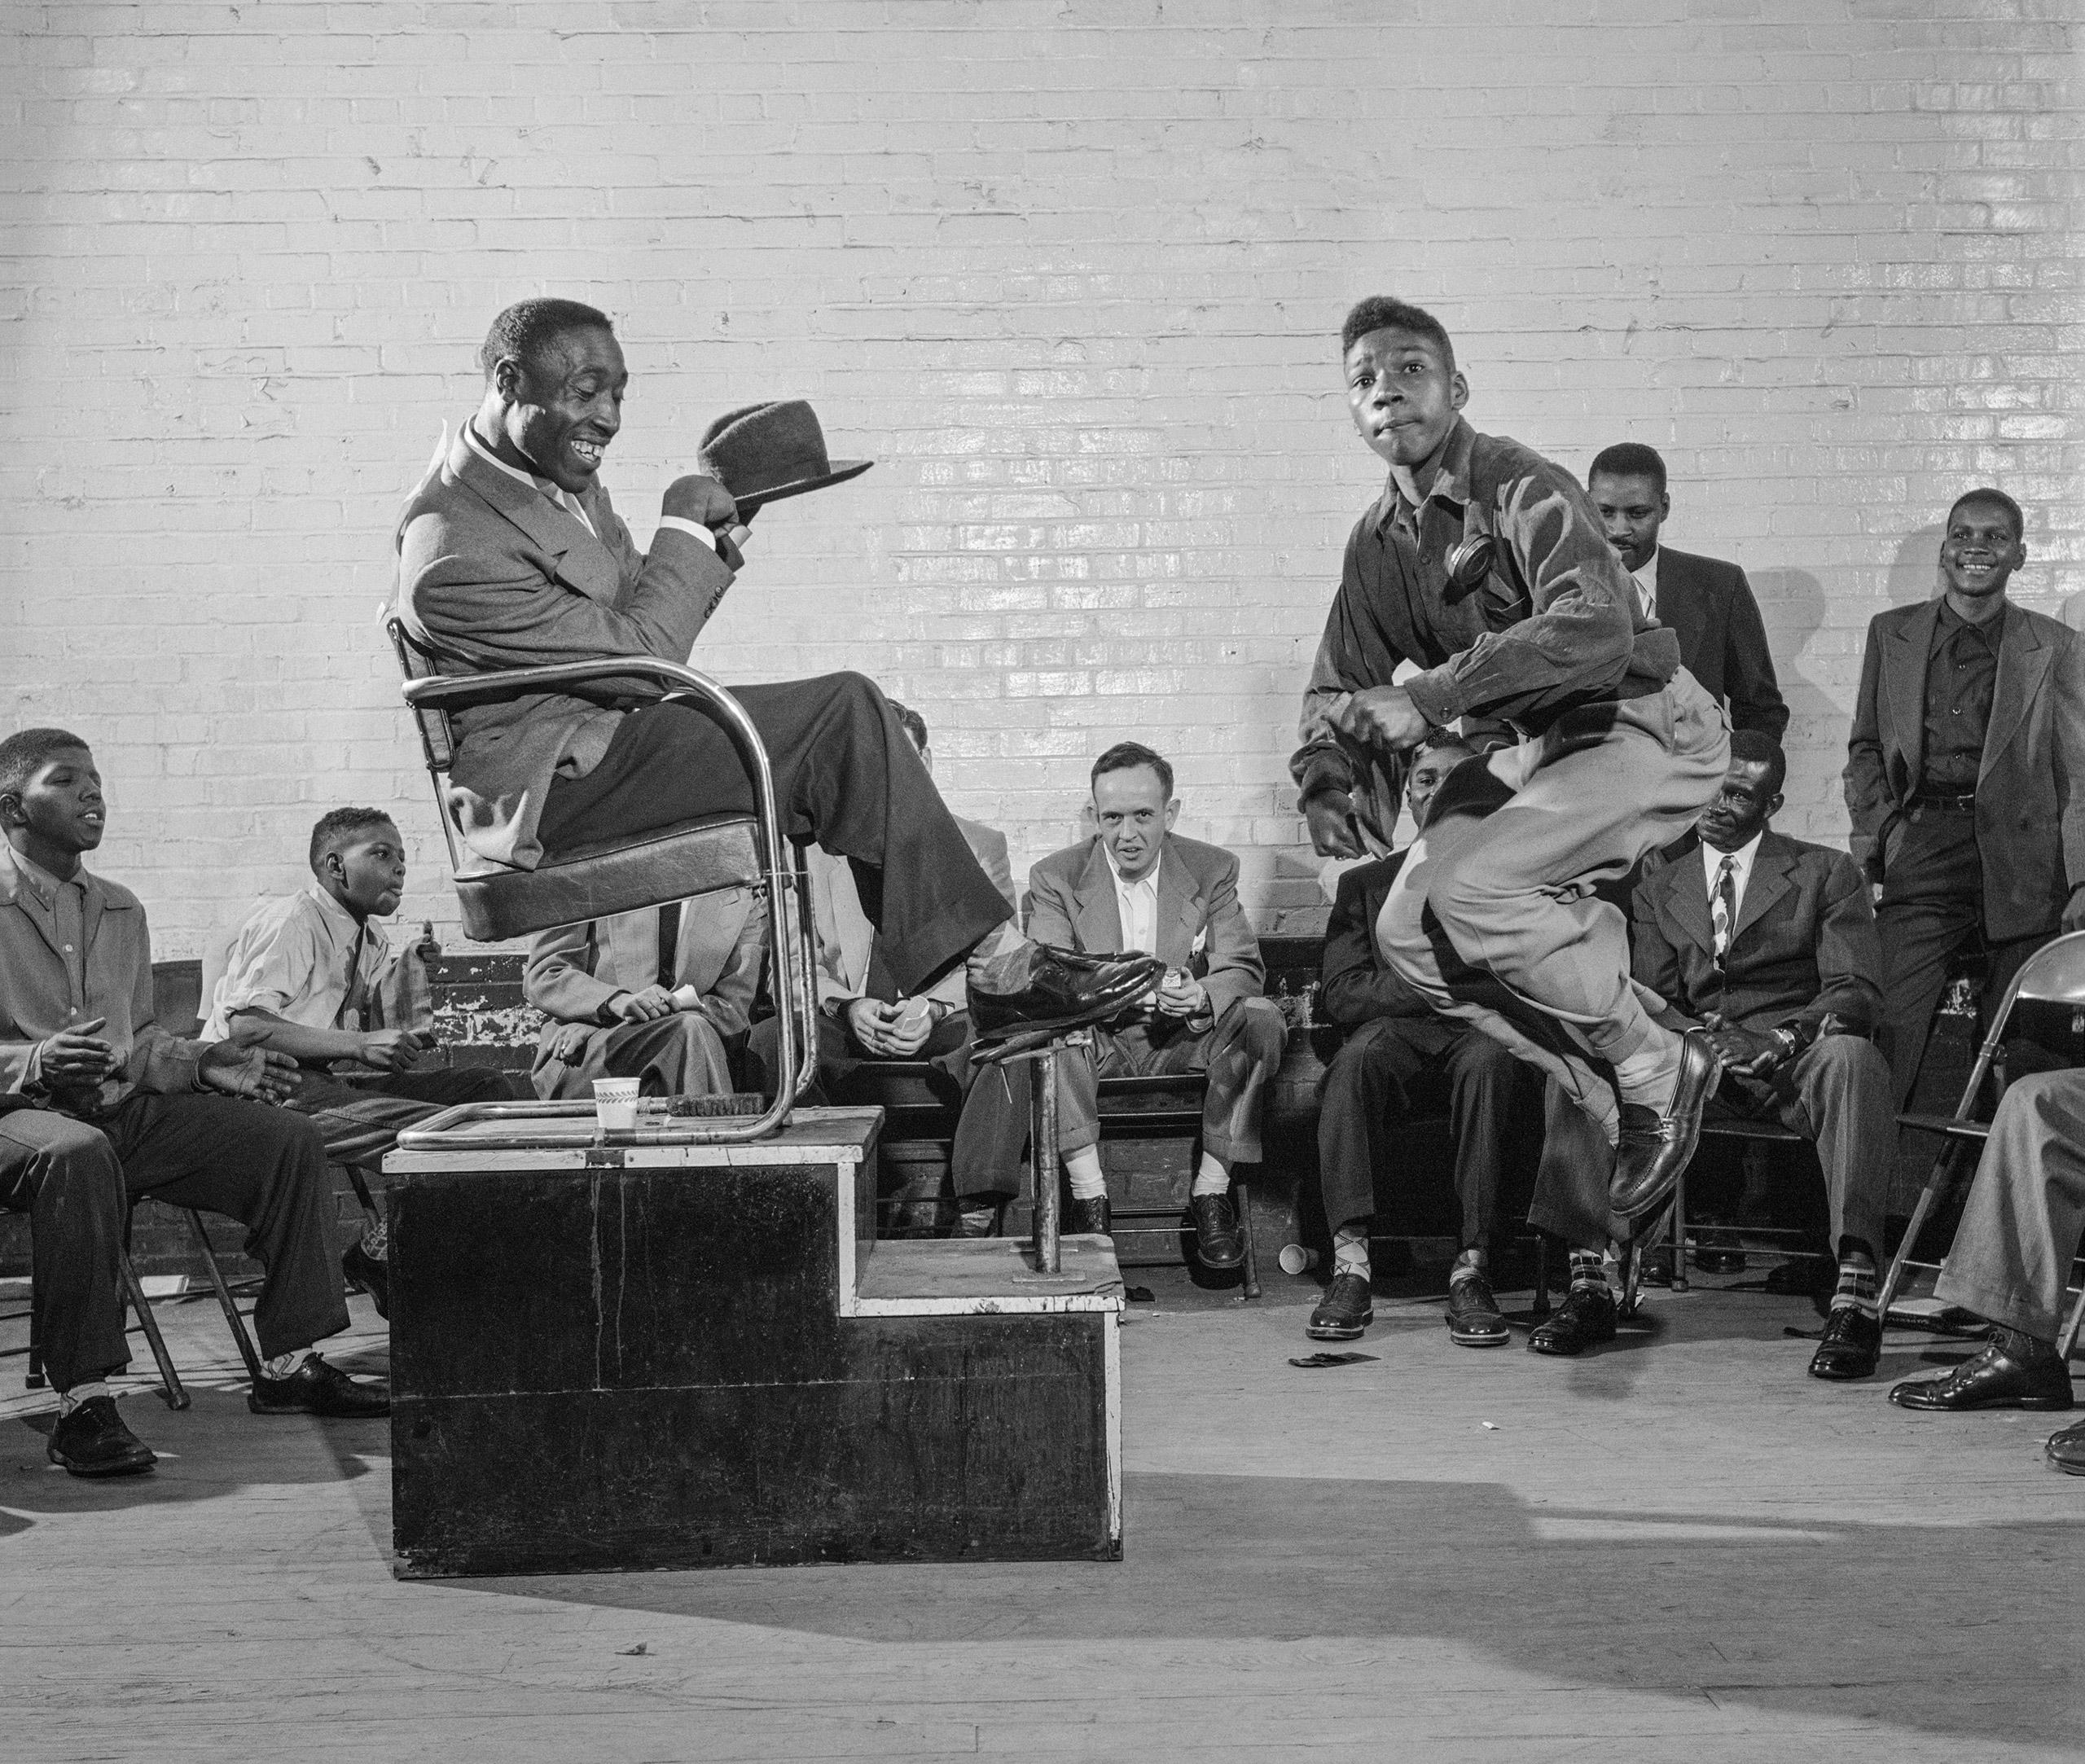 Shoeshine contest, Wilson, North Carolina, 1952.